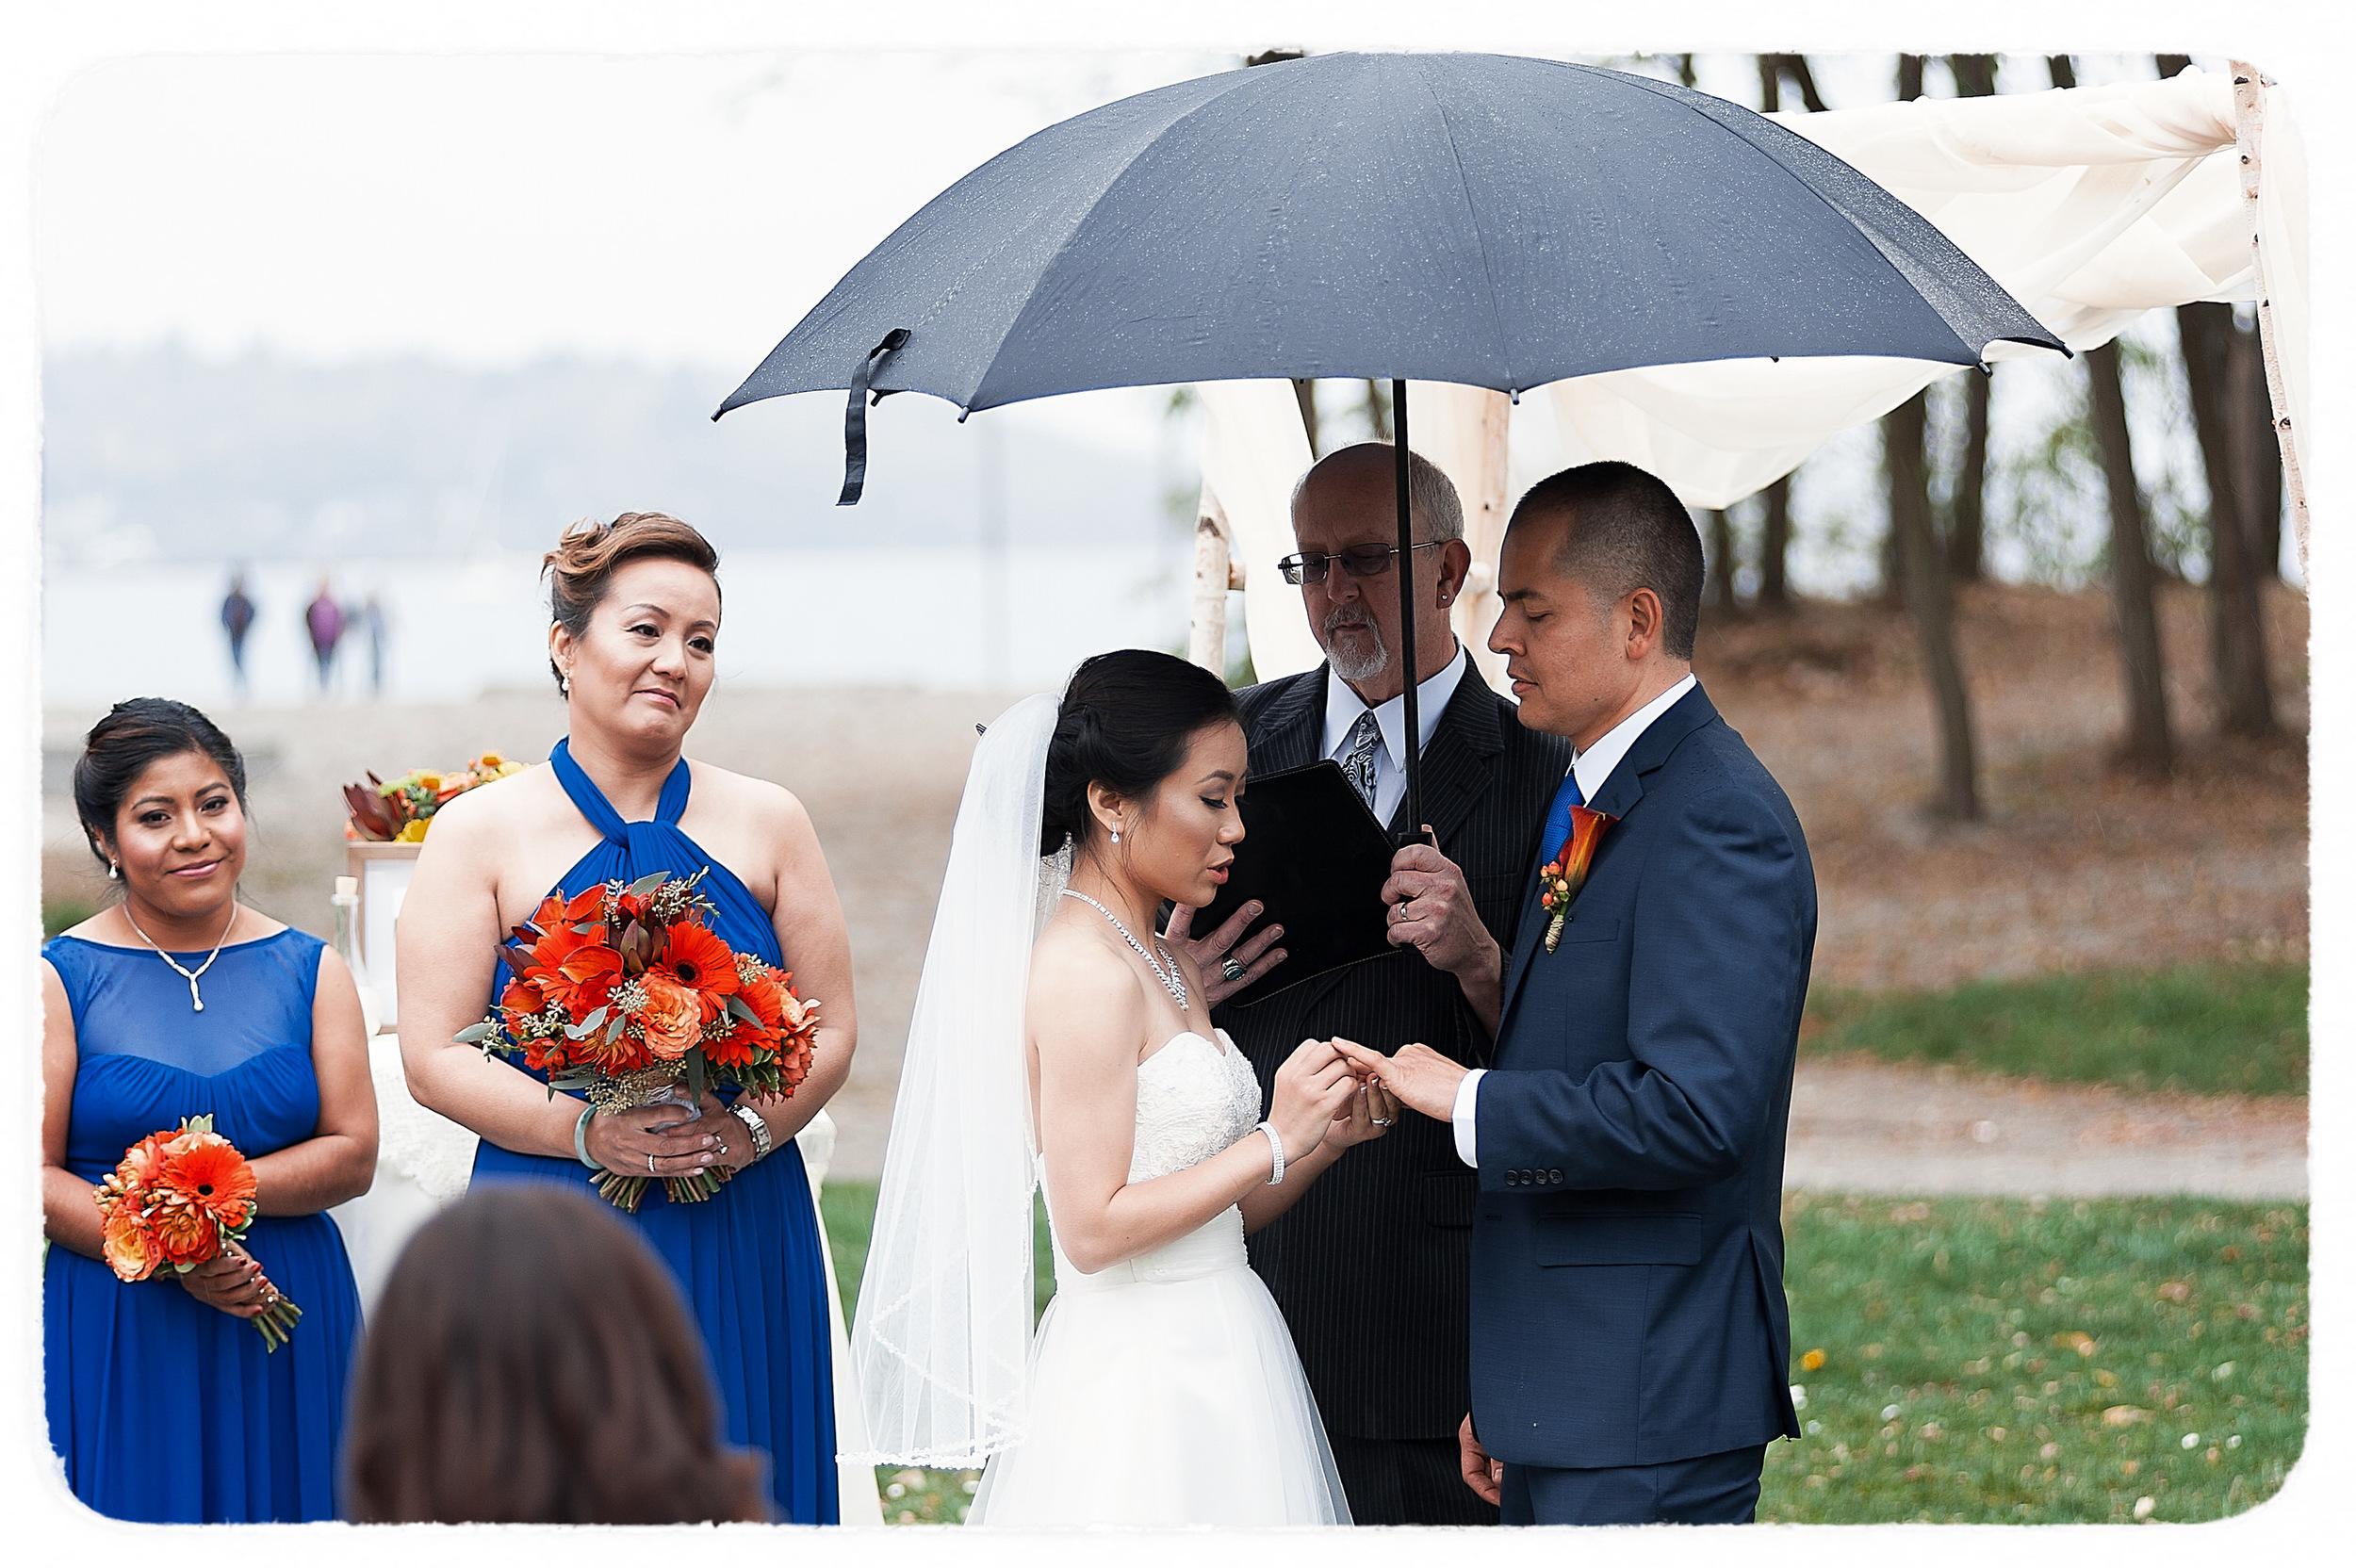 Kate&Jose-Wedding-OriginalCollection-220Film.jpg